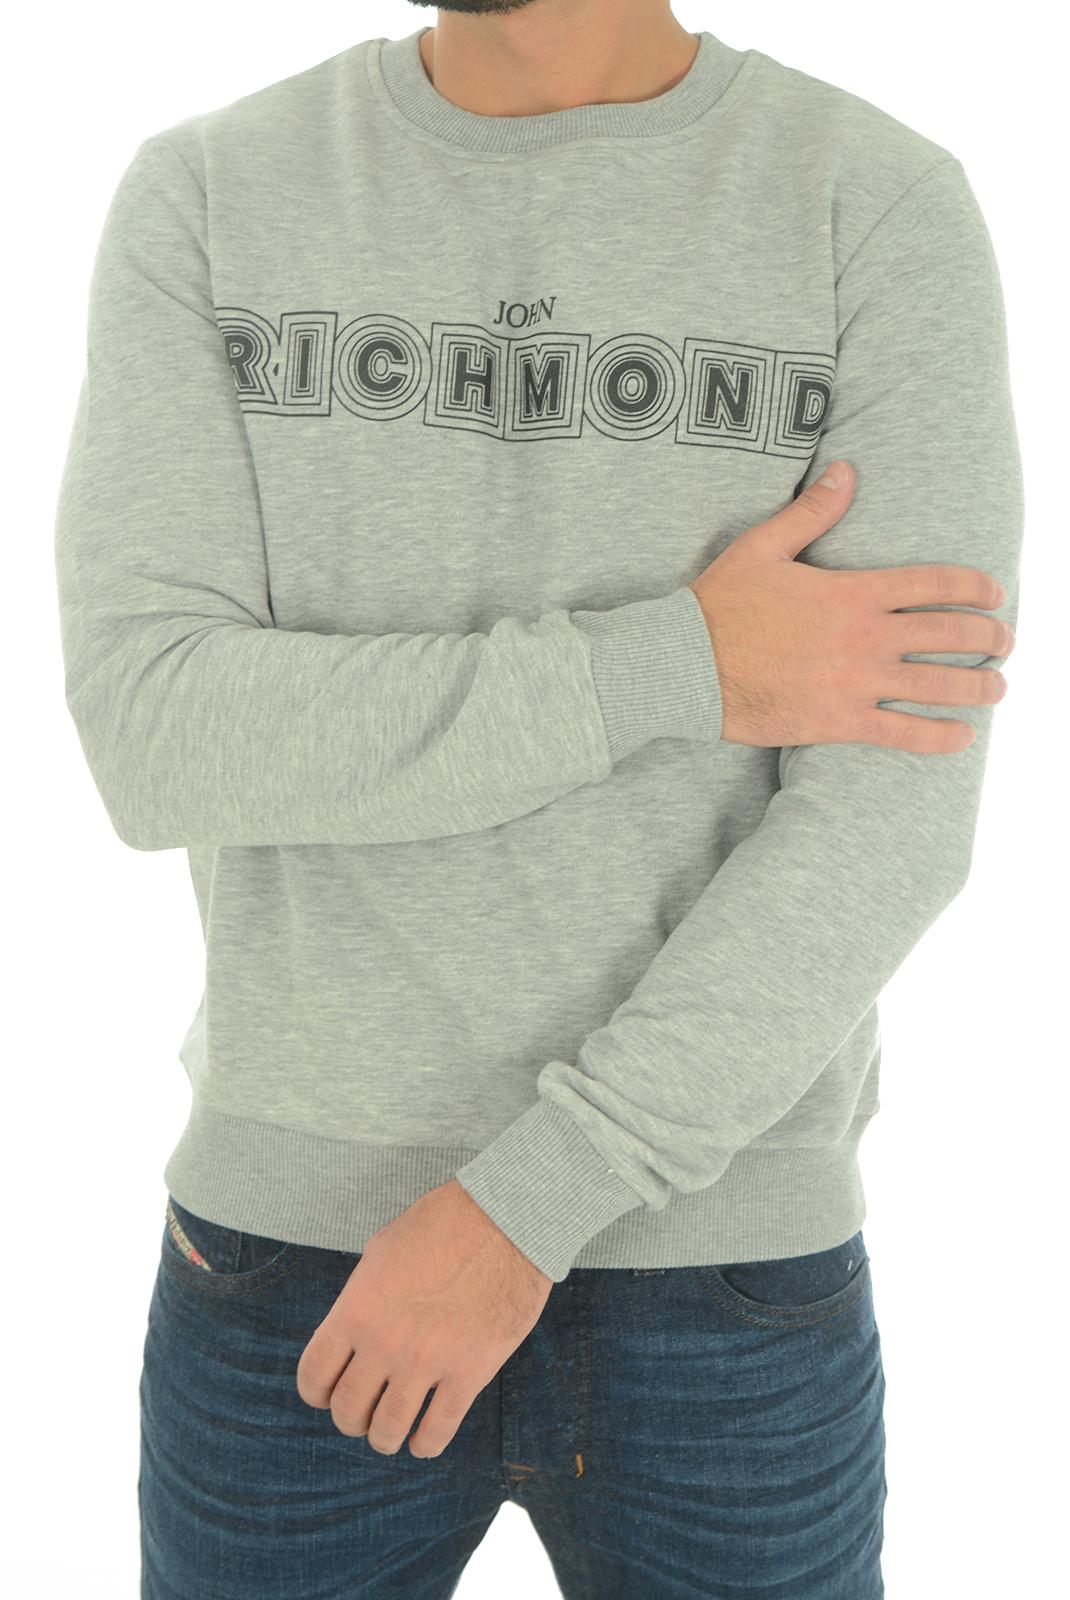 Sweatshirts  John richmond SIDROLAN W0066 GRIGIO MEL